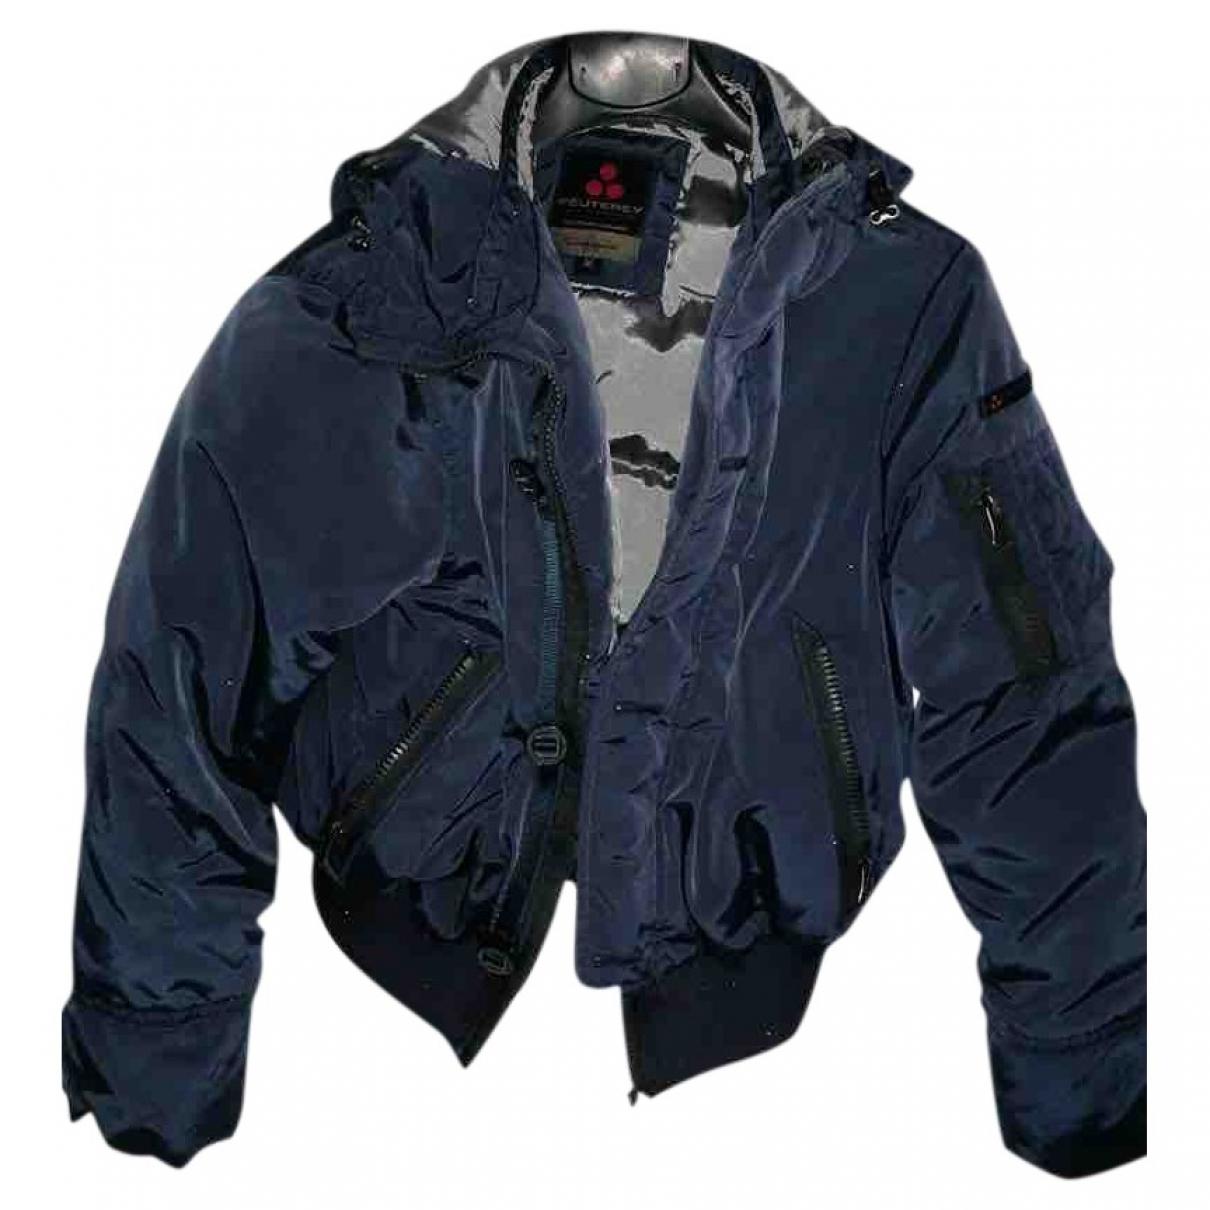 Peuterey \N Blue jacket & coat for Kids 16 years - M UK